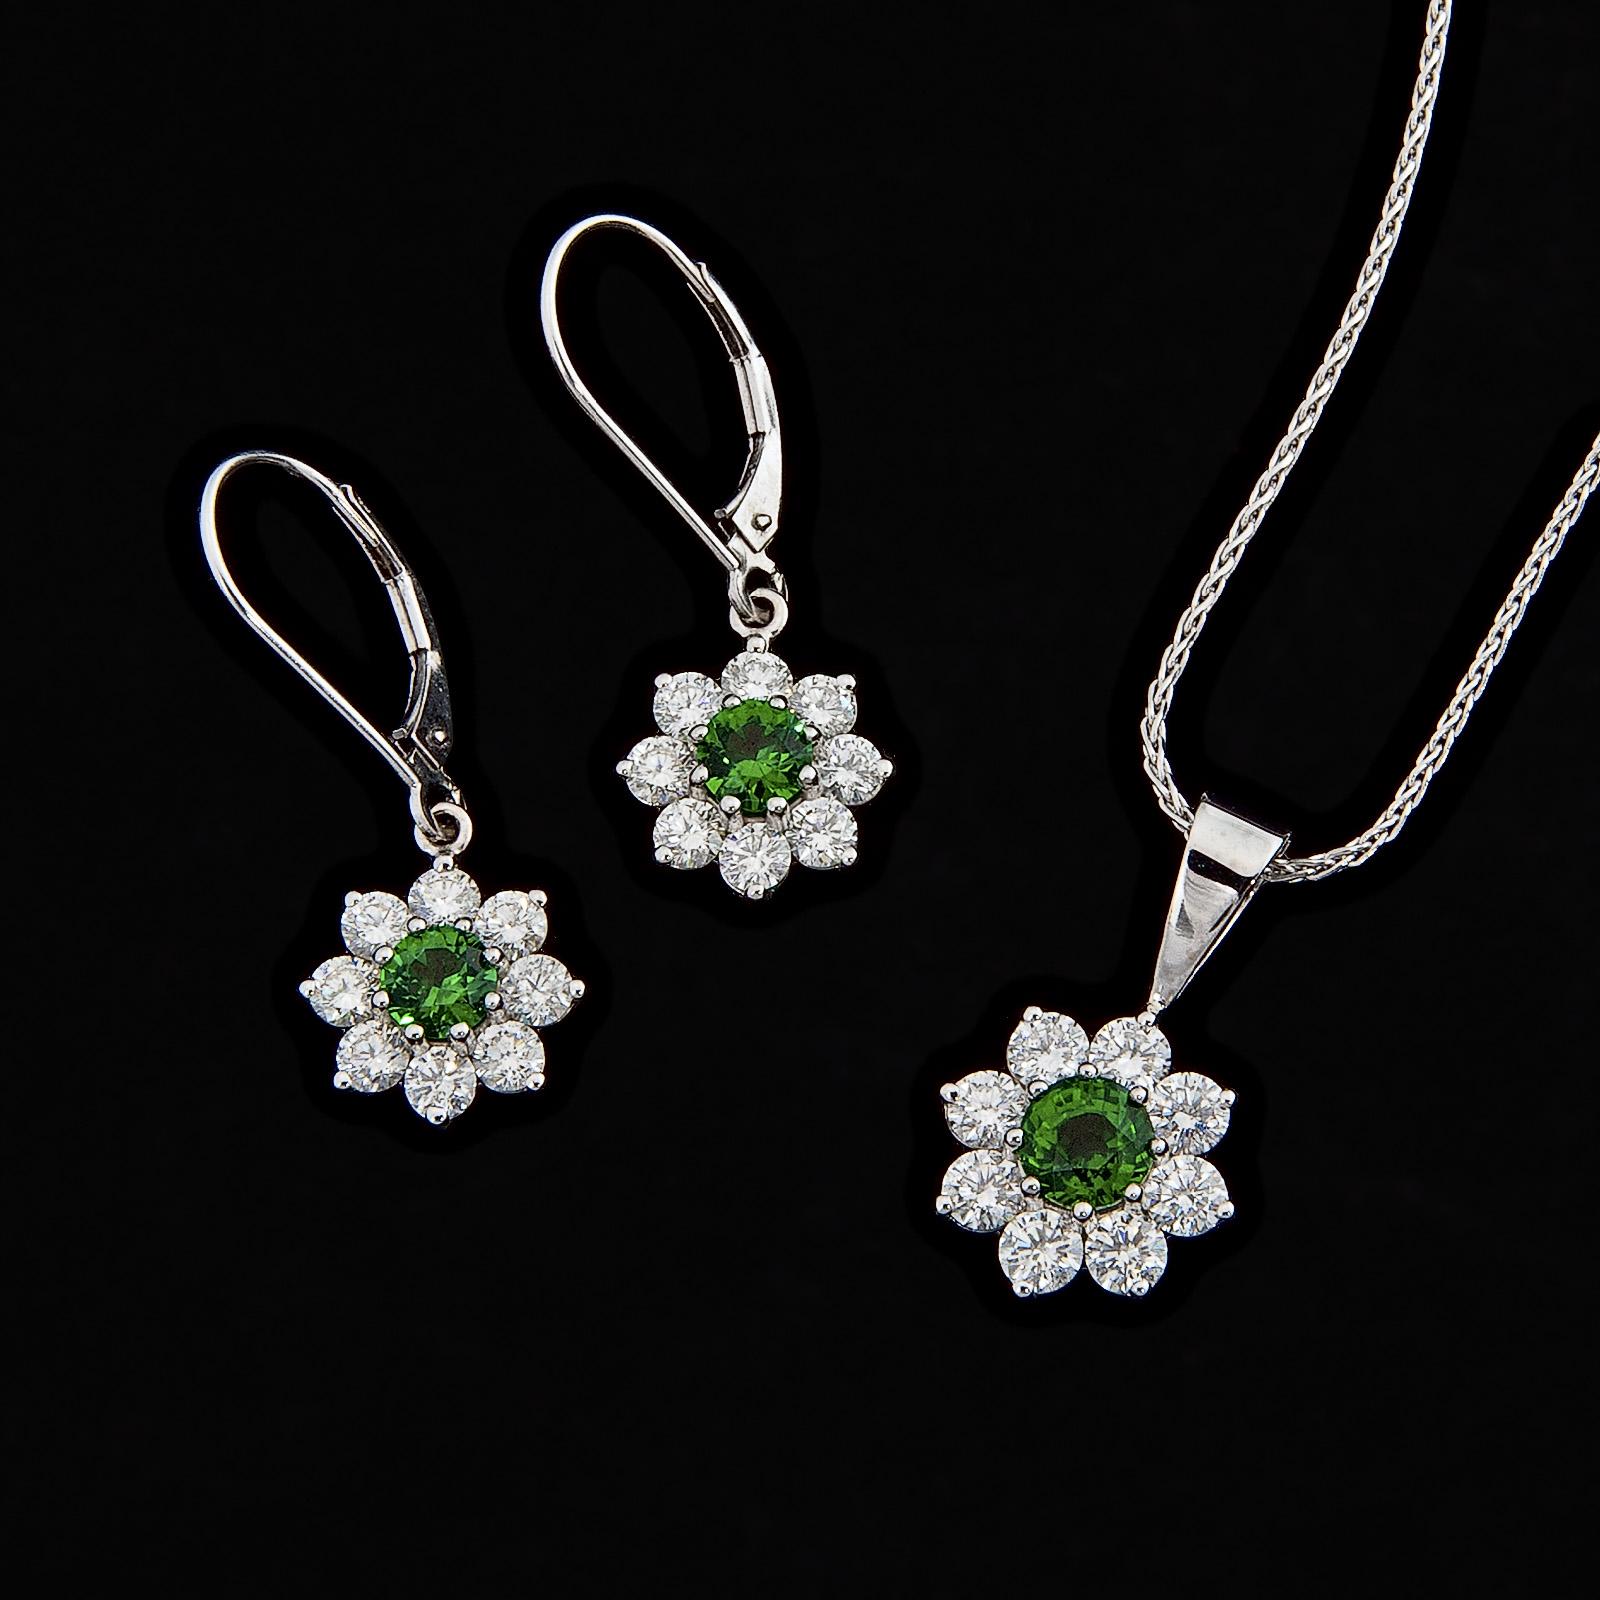 Tsavorite garnet earrings and necklace